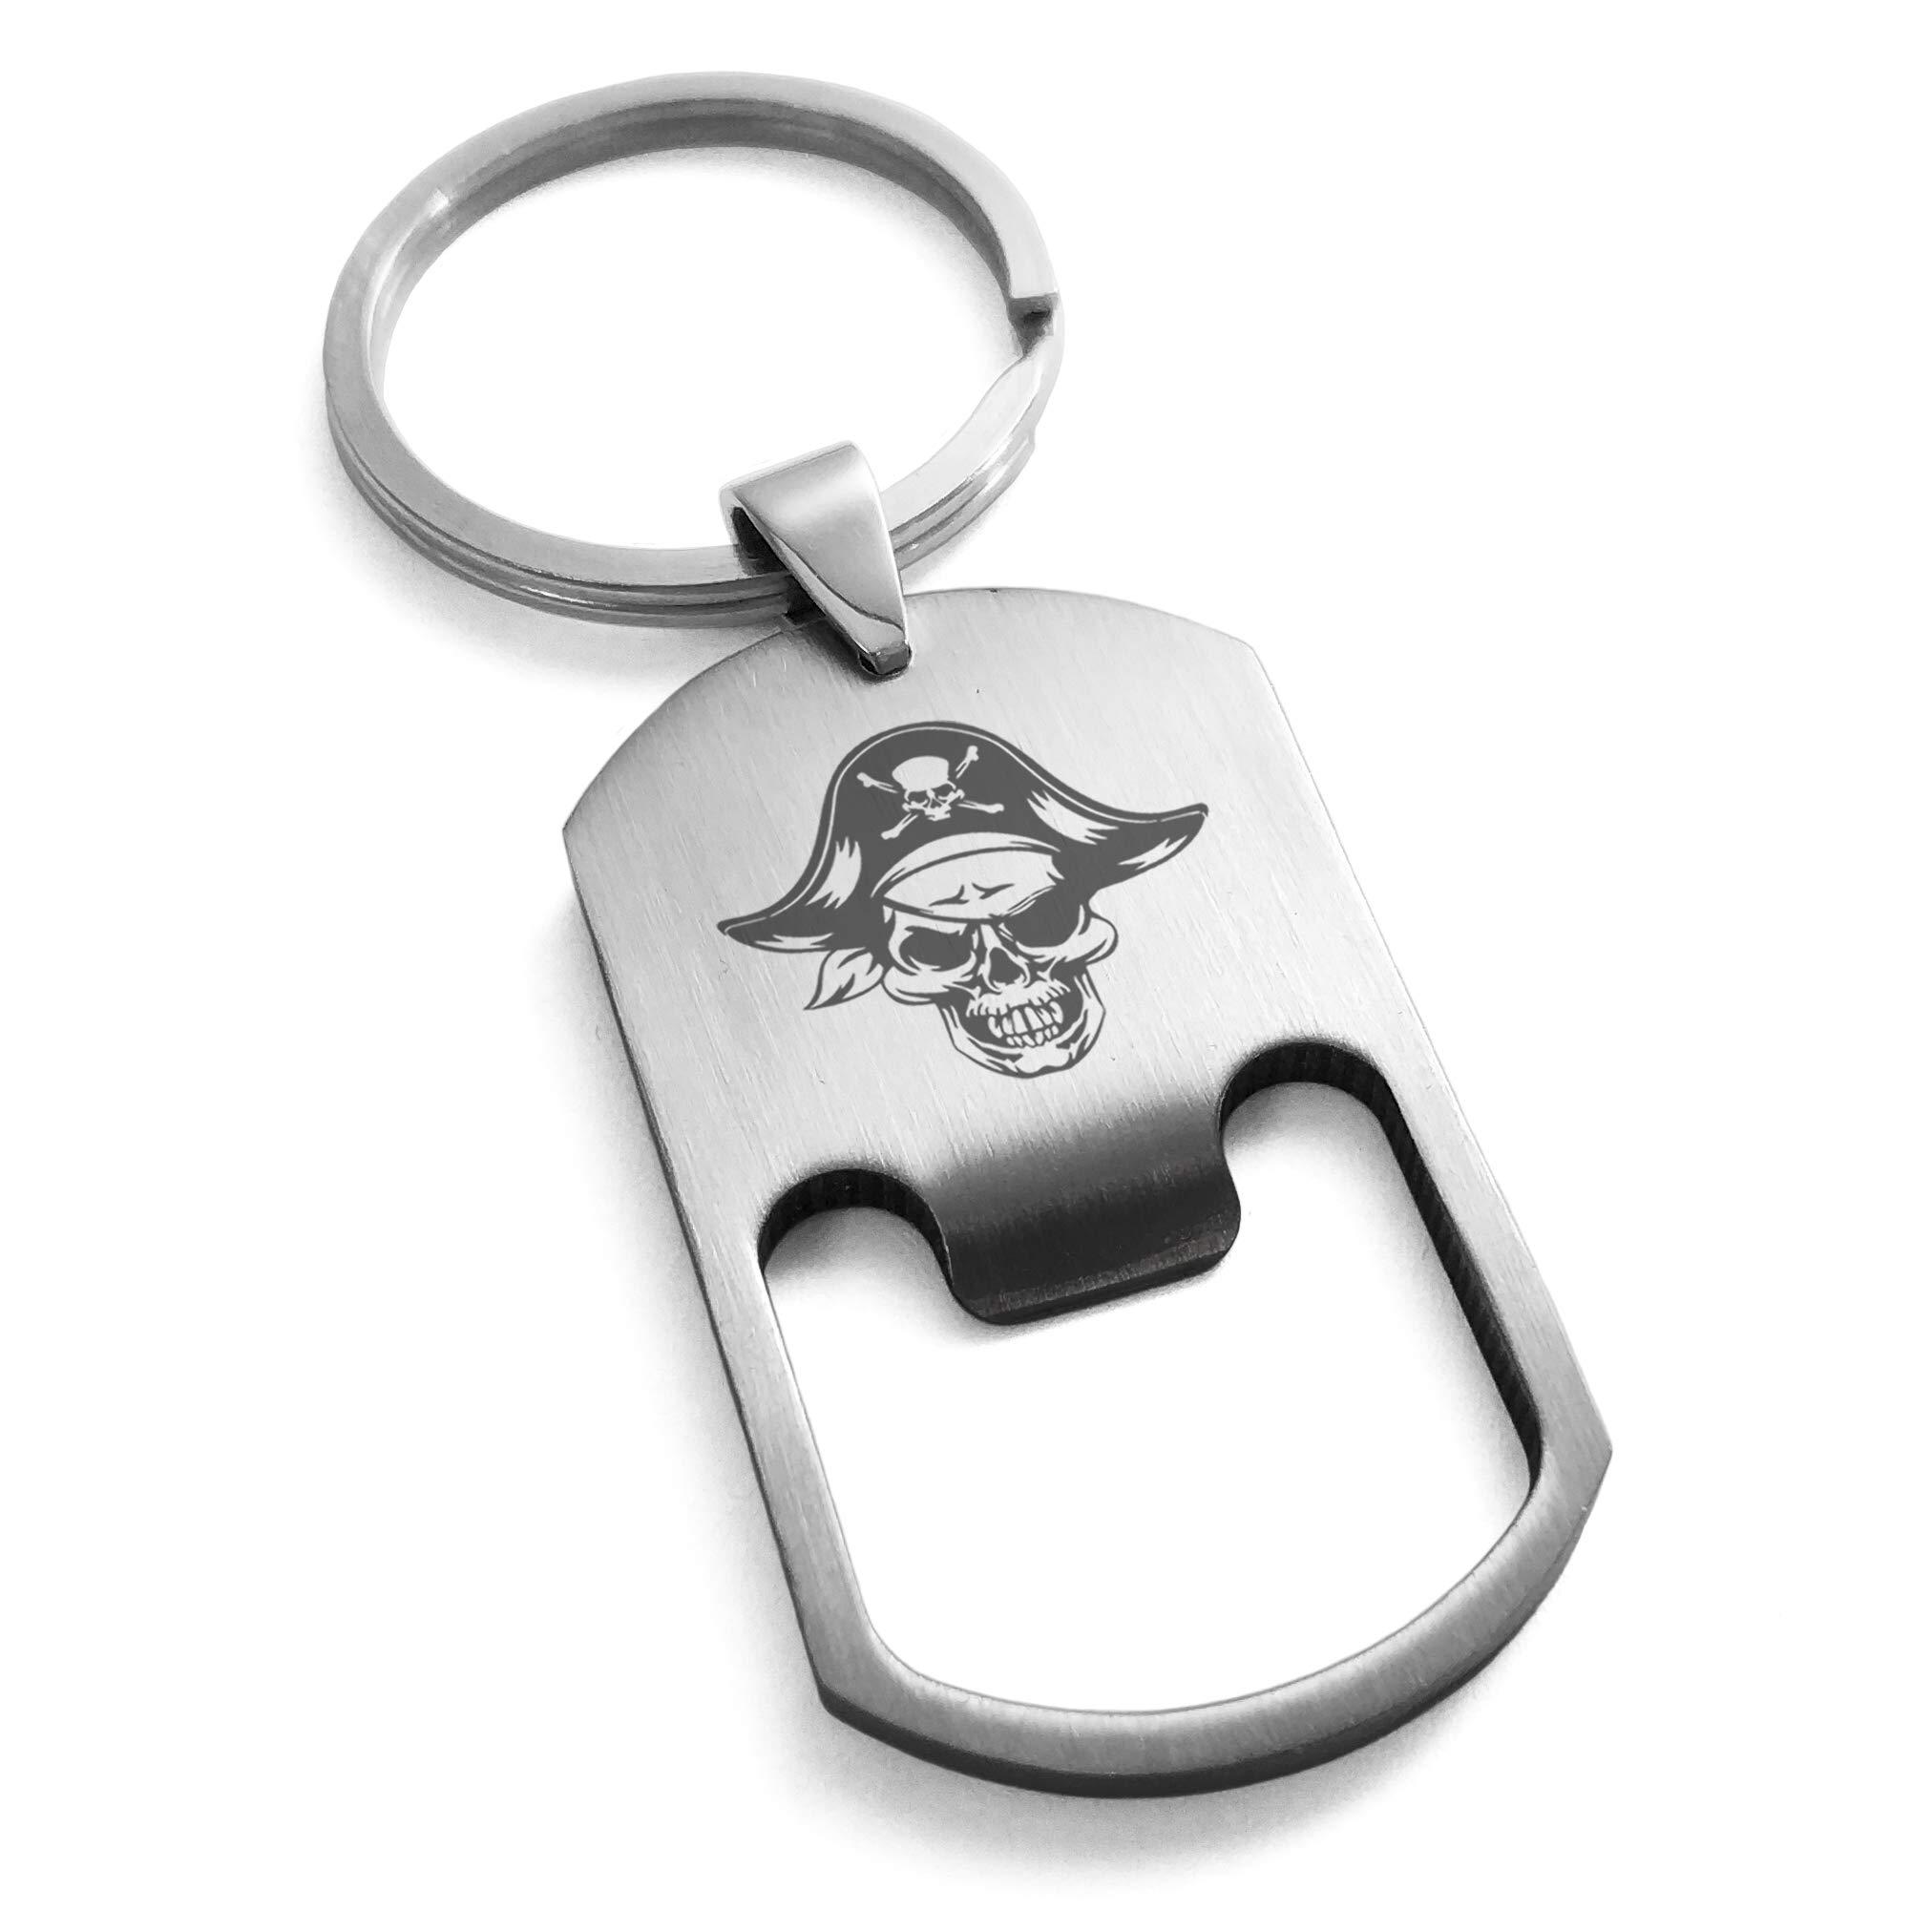 Tioneer Stainless Steel Pirate Captain Skull Engraved Bottle Opener Dog Tag Keychain Keyring